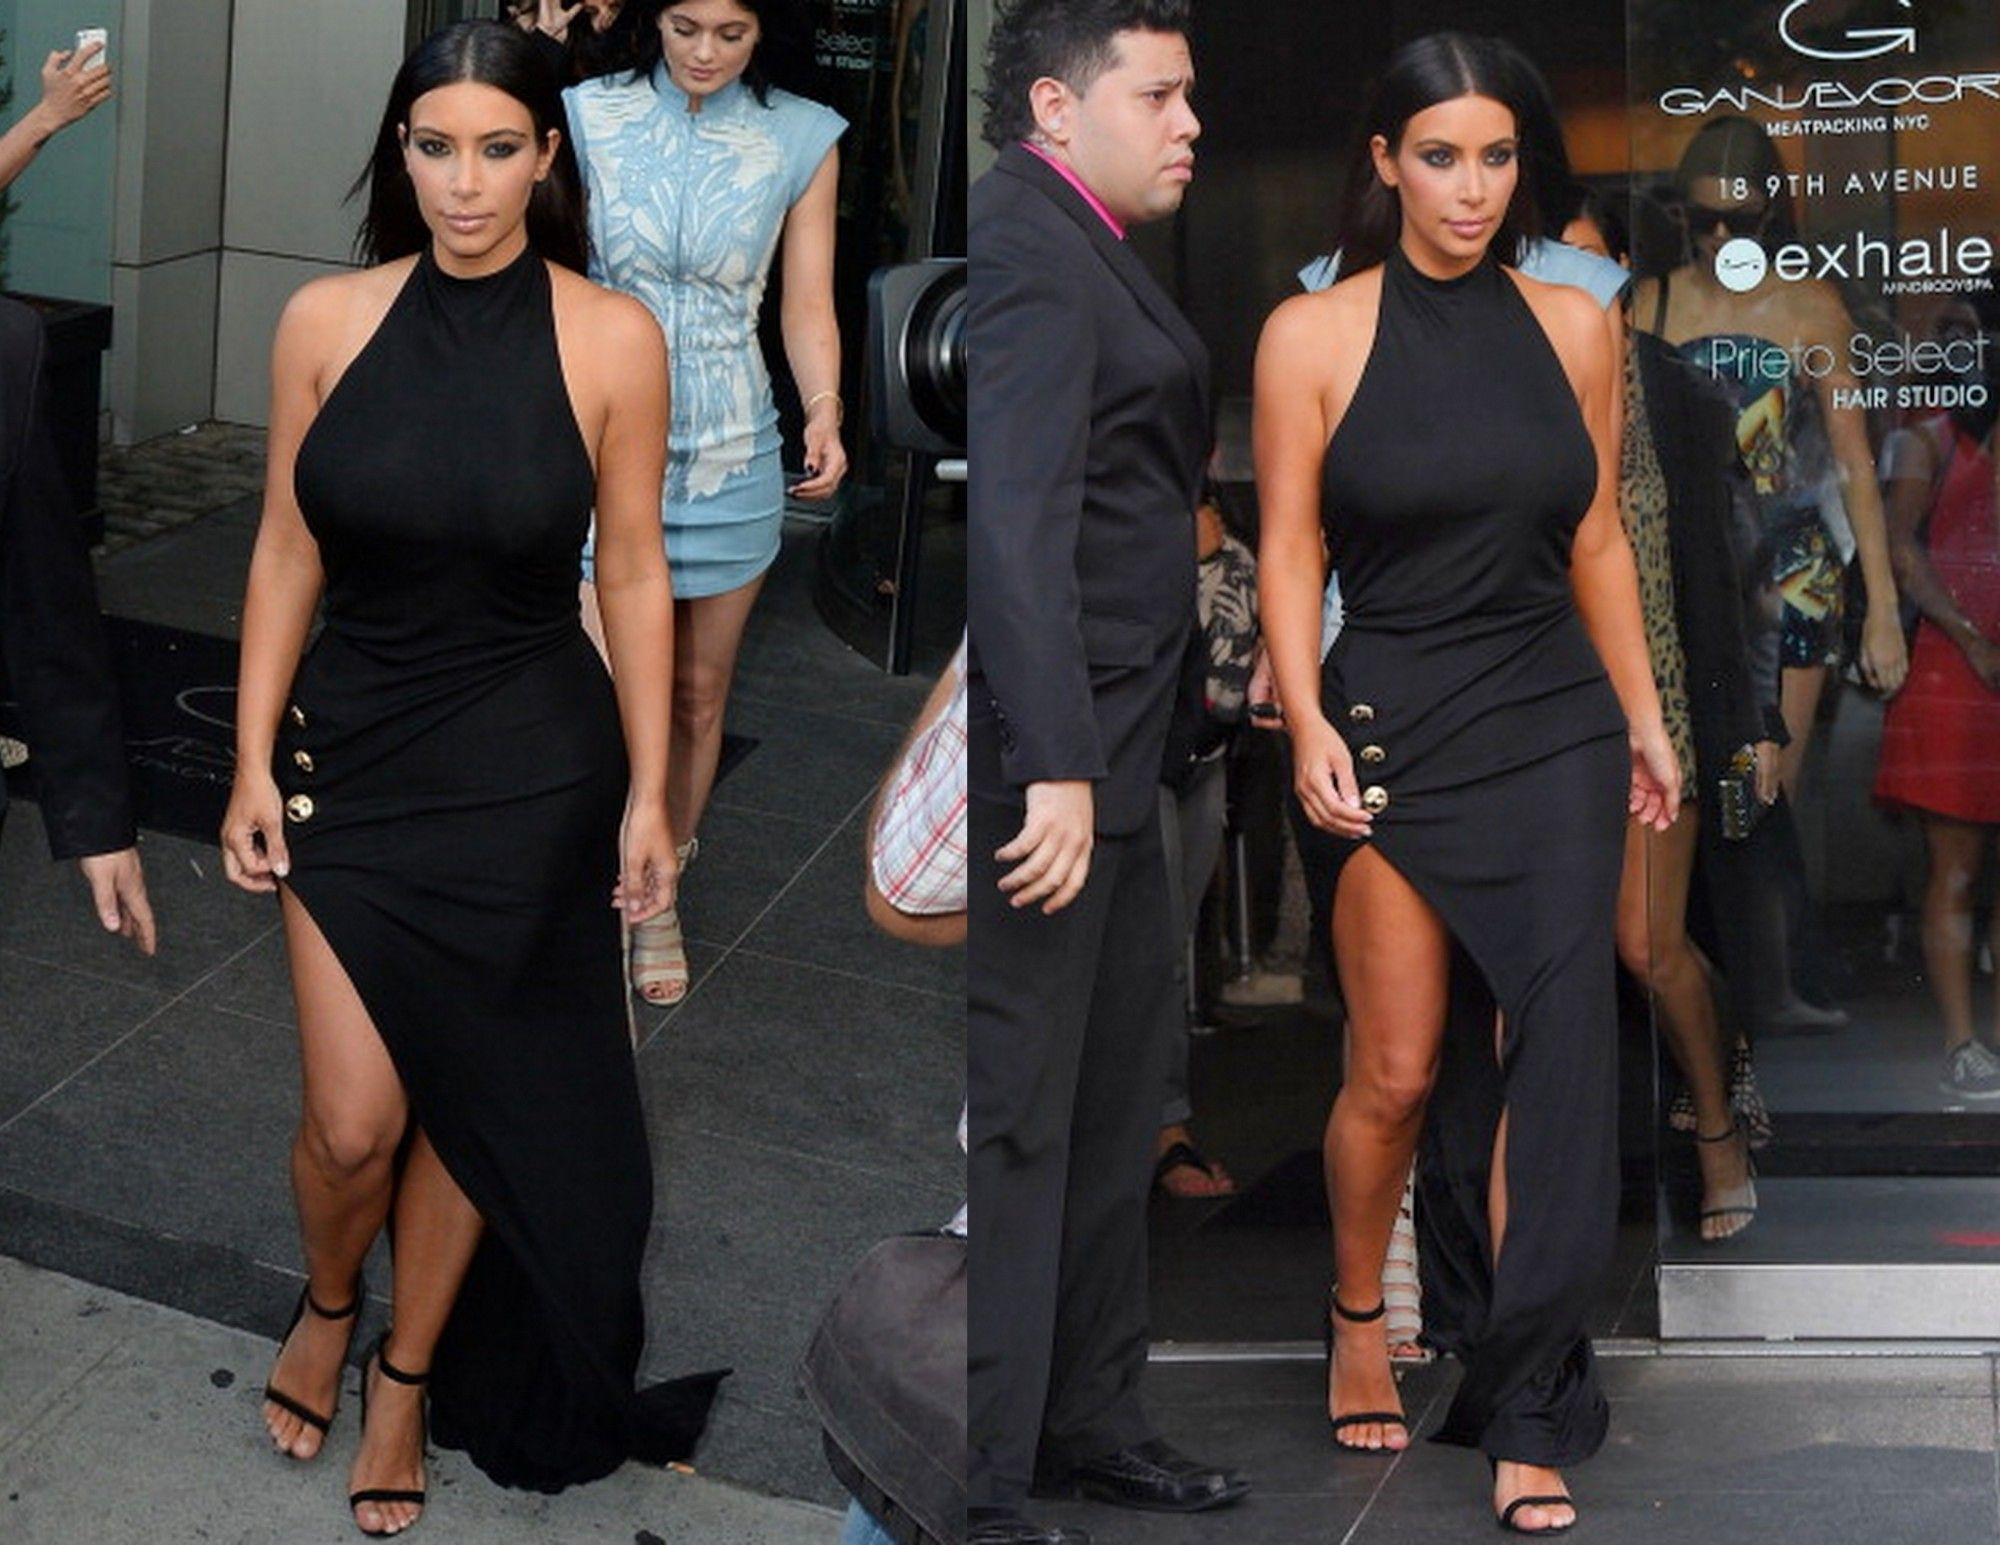 Dress black kim kardashian - Kim Kardashian In Balmain Khloe Kardashian 30th Birthday Celebrations E1403874983243 Jpg 2 000 1 545 Pixels Lbd Pinterest Balmain Paris Kim